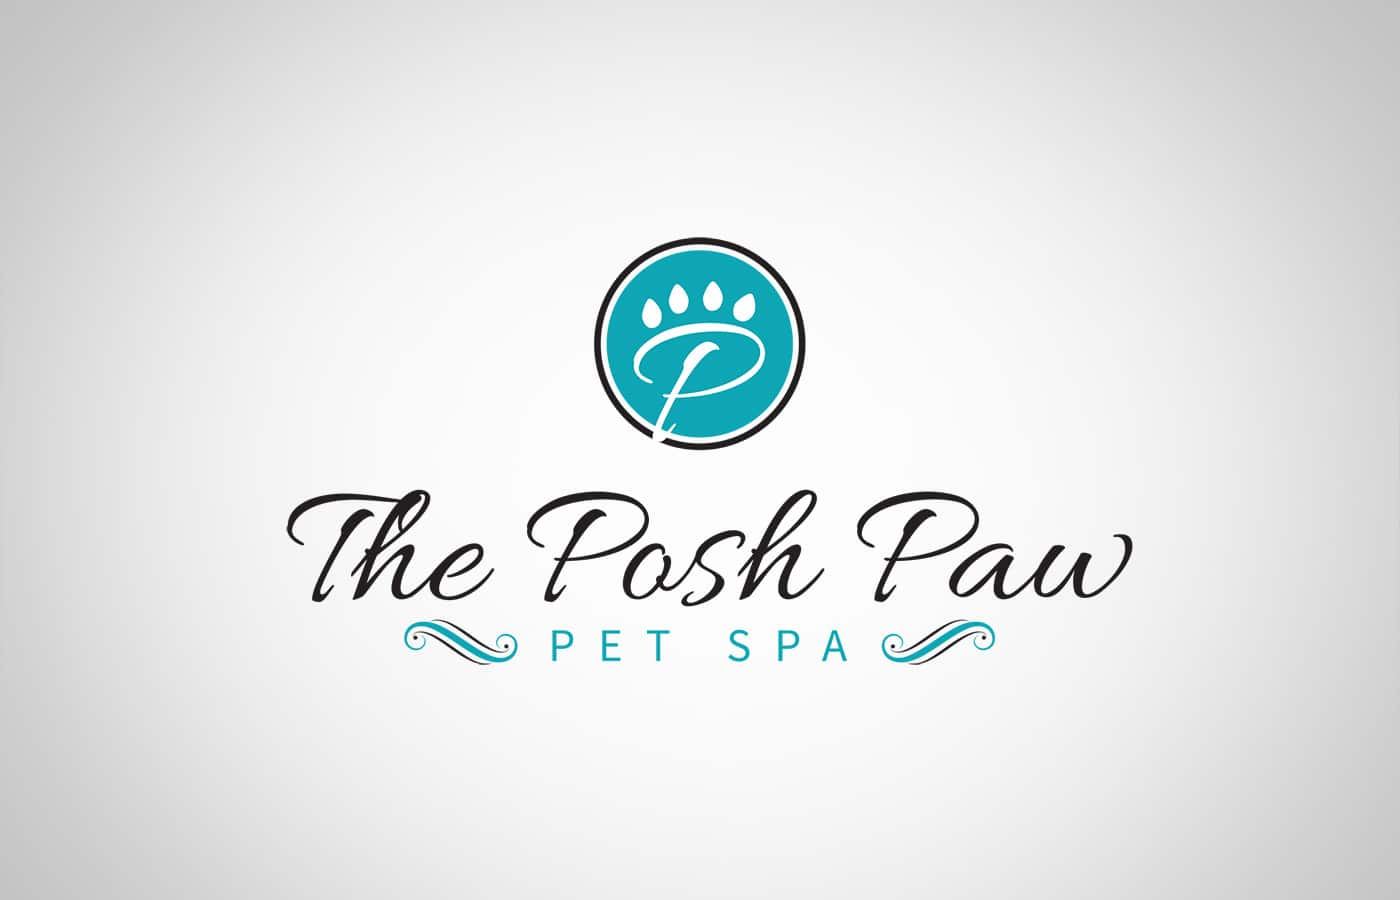 Edmonton Graphic Design | The Posh Paw Pet Spa Logo